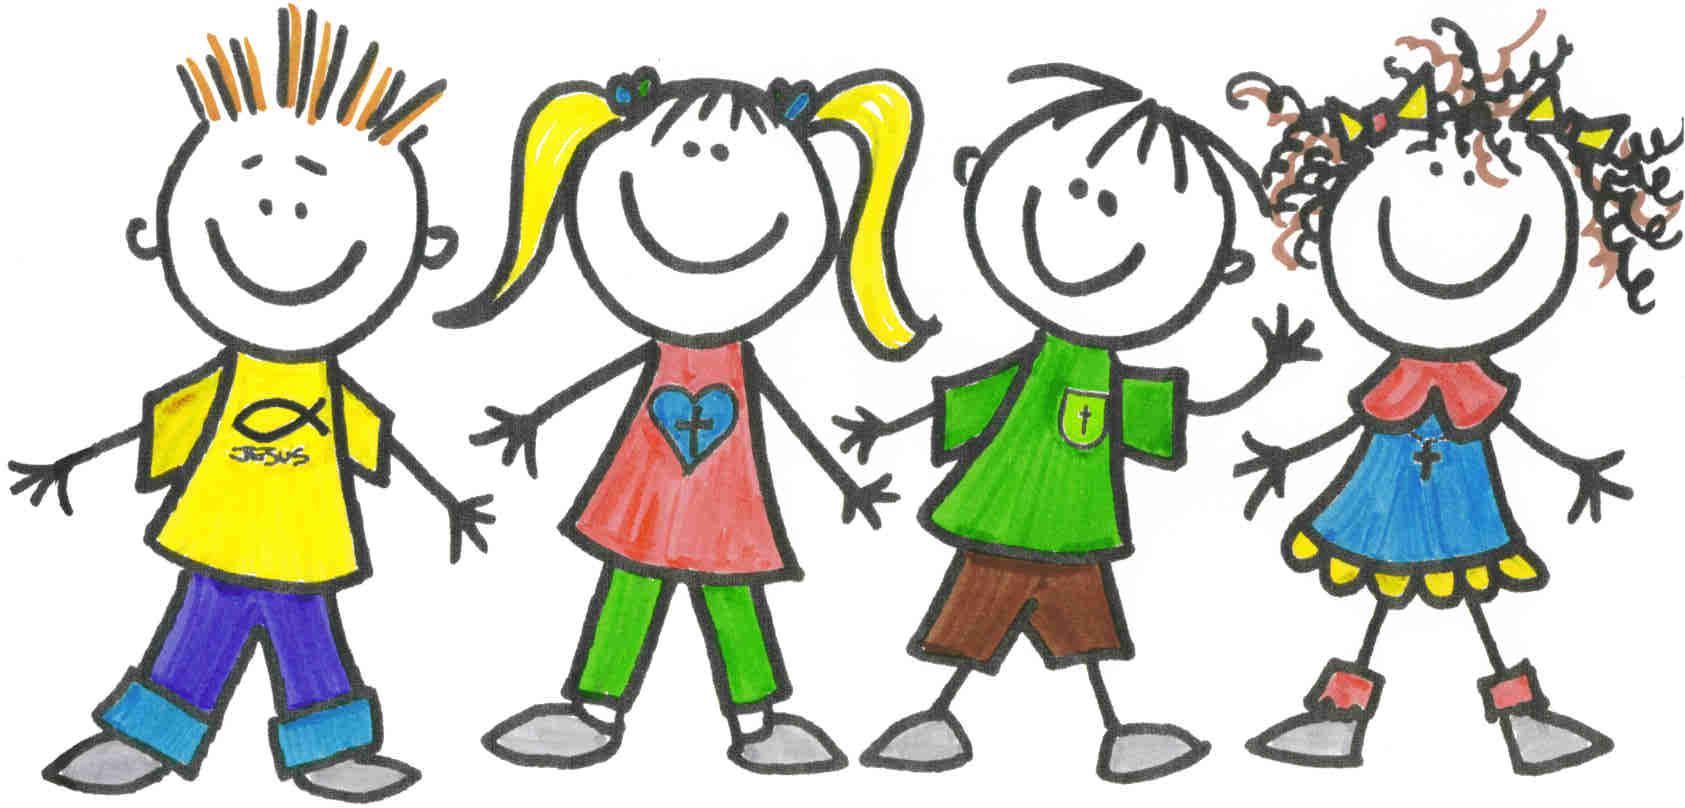 Kind clipart 6 child, Kind 6 child Transparent FREE for.